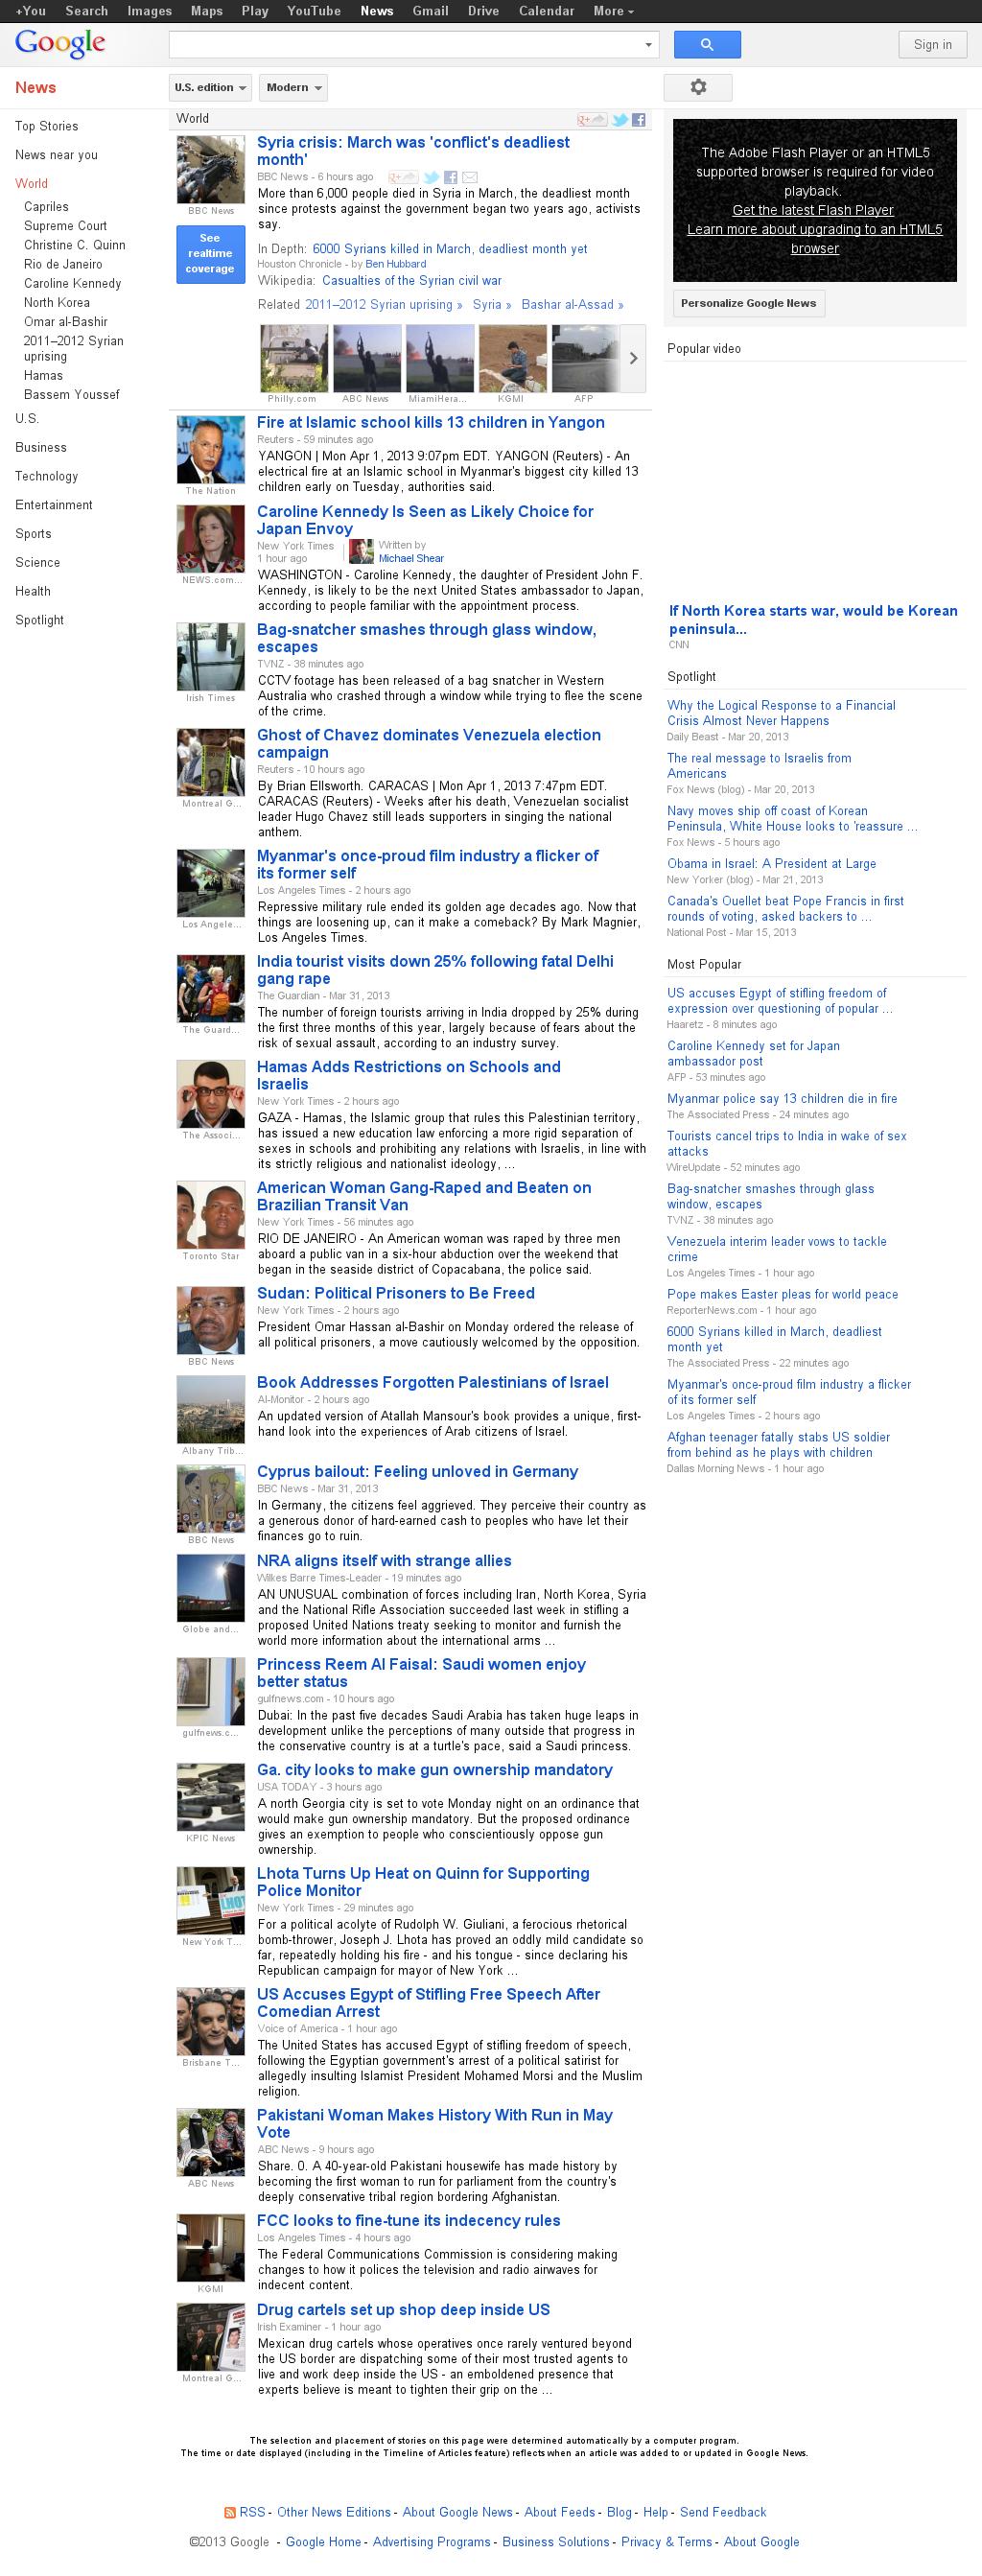 Google News: World at Tuesday April 2, 2013, 2:08 a.m. UTC